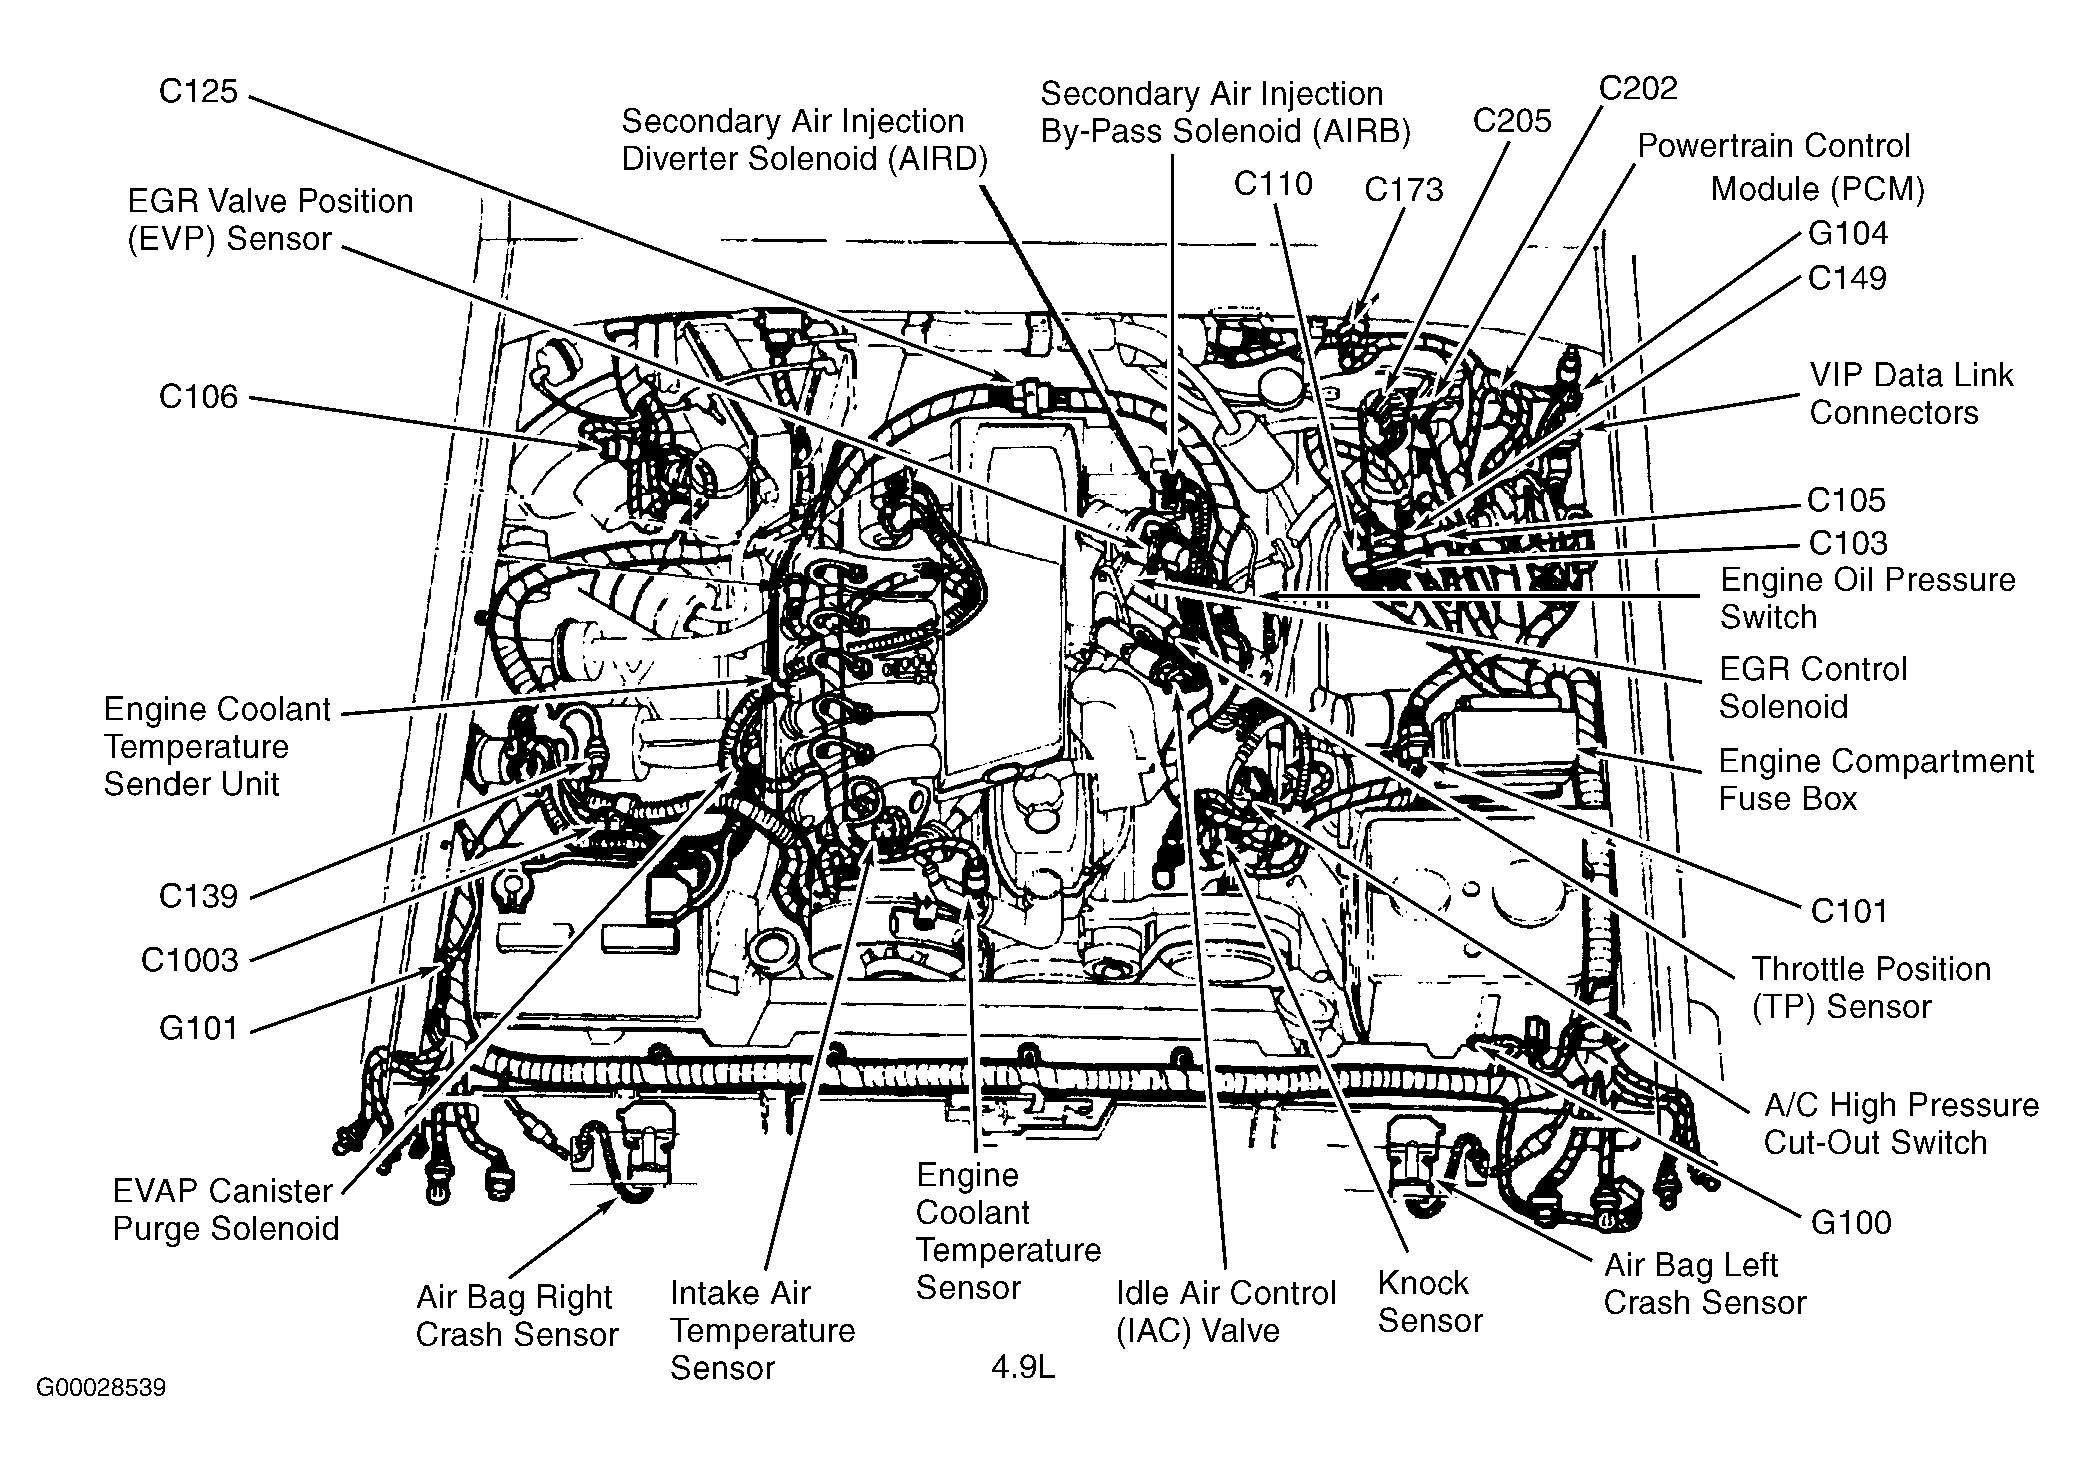 s10 engine wiring diagram nt 3153  oldsmobile bravada engine diagram download diagram  oldsmobile bravada engine diagram